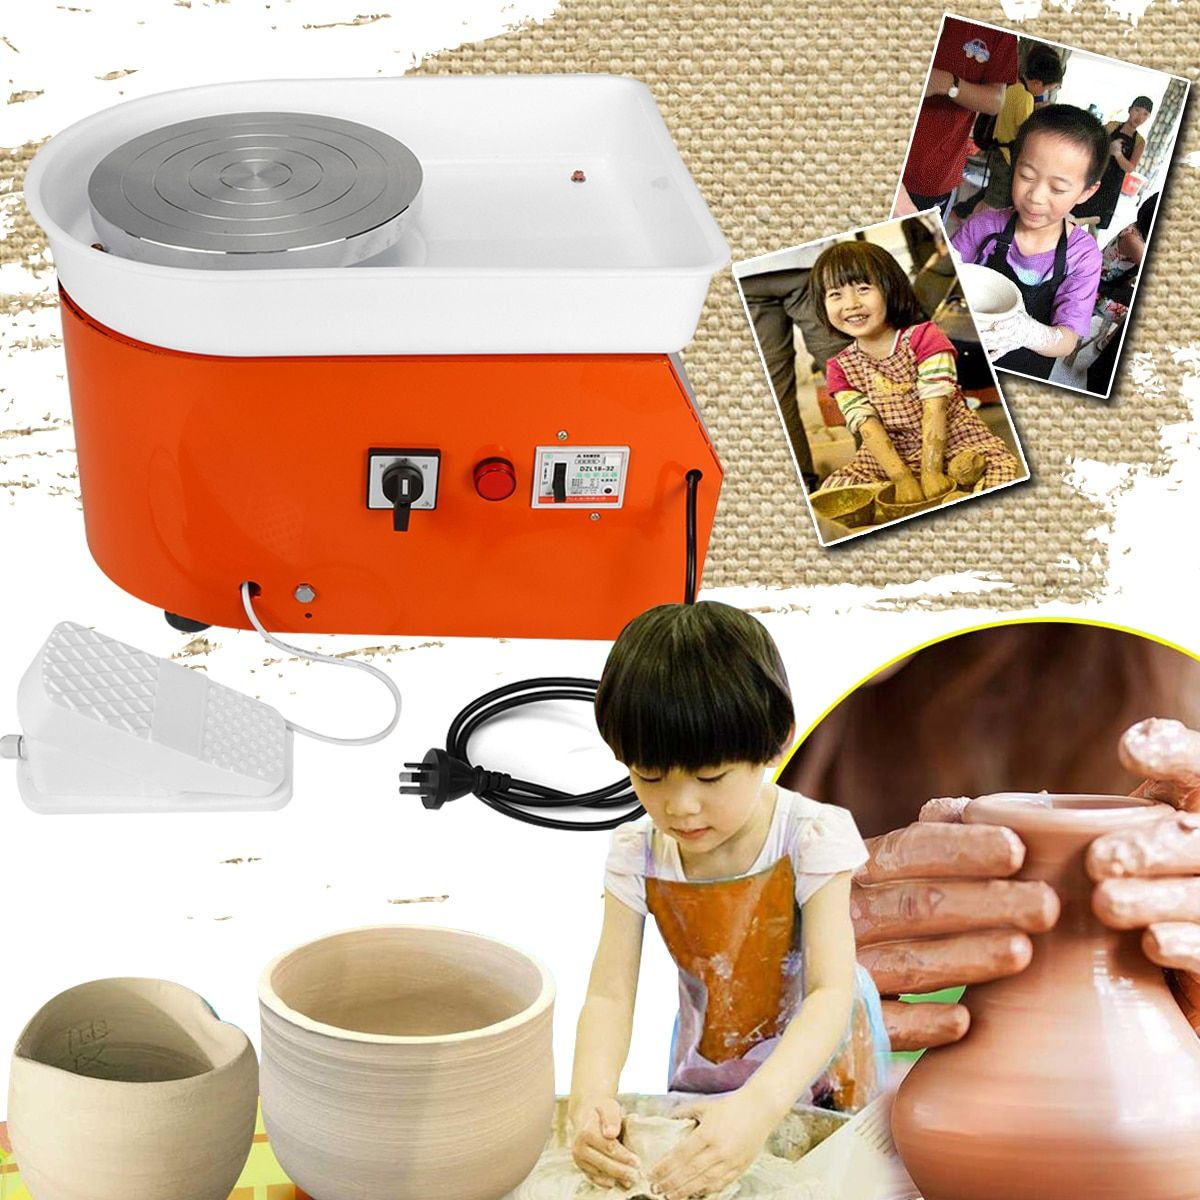 25cm Pottery Wheel Machine Ceramic Work Ceramics Clay Art EU/AU AC220V 250-350W With Mobile Flexible Foot Pedal Smooth Low Noise